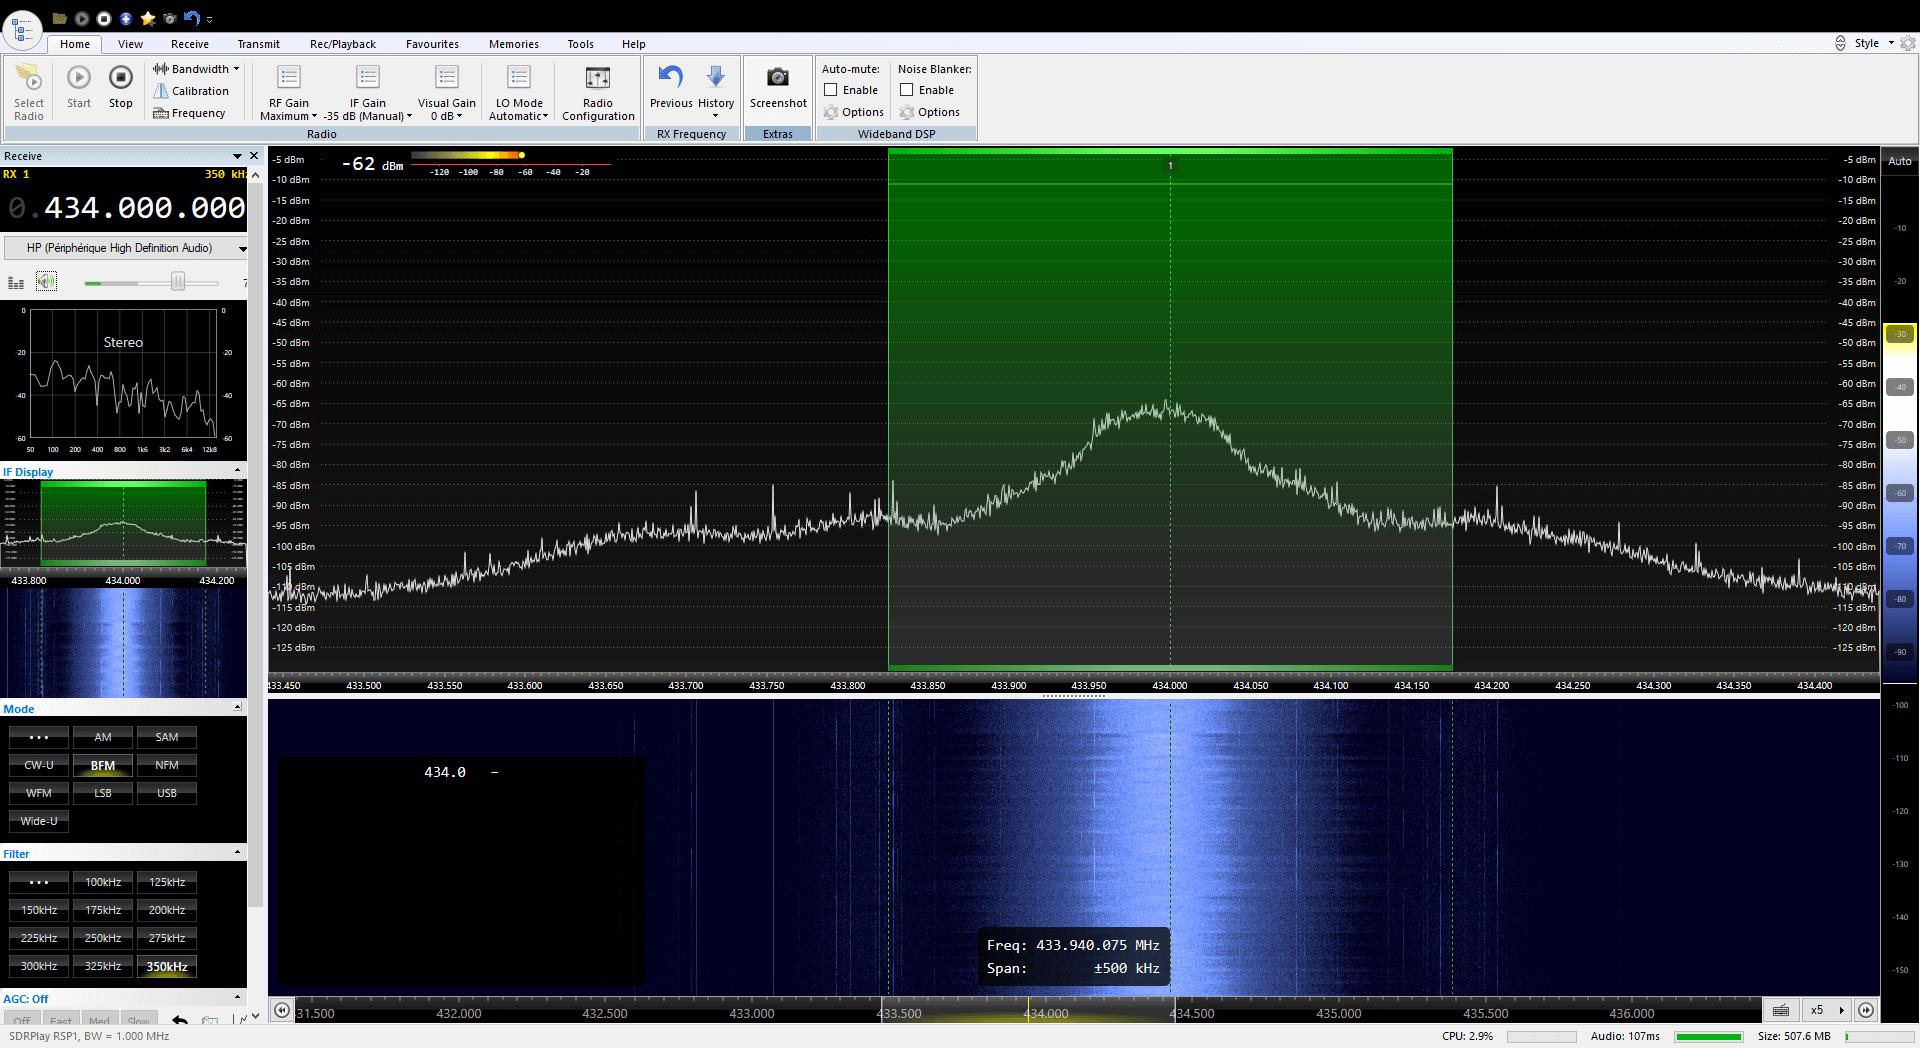 RPiTX v2 re-transmitting a broadcast FM signal live at 434 MHz.